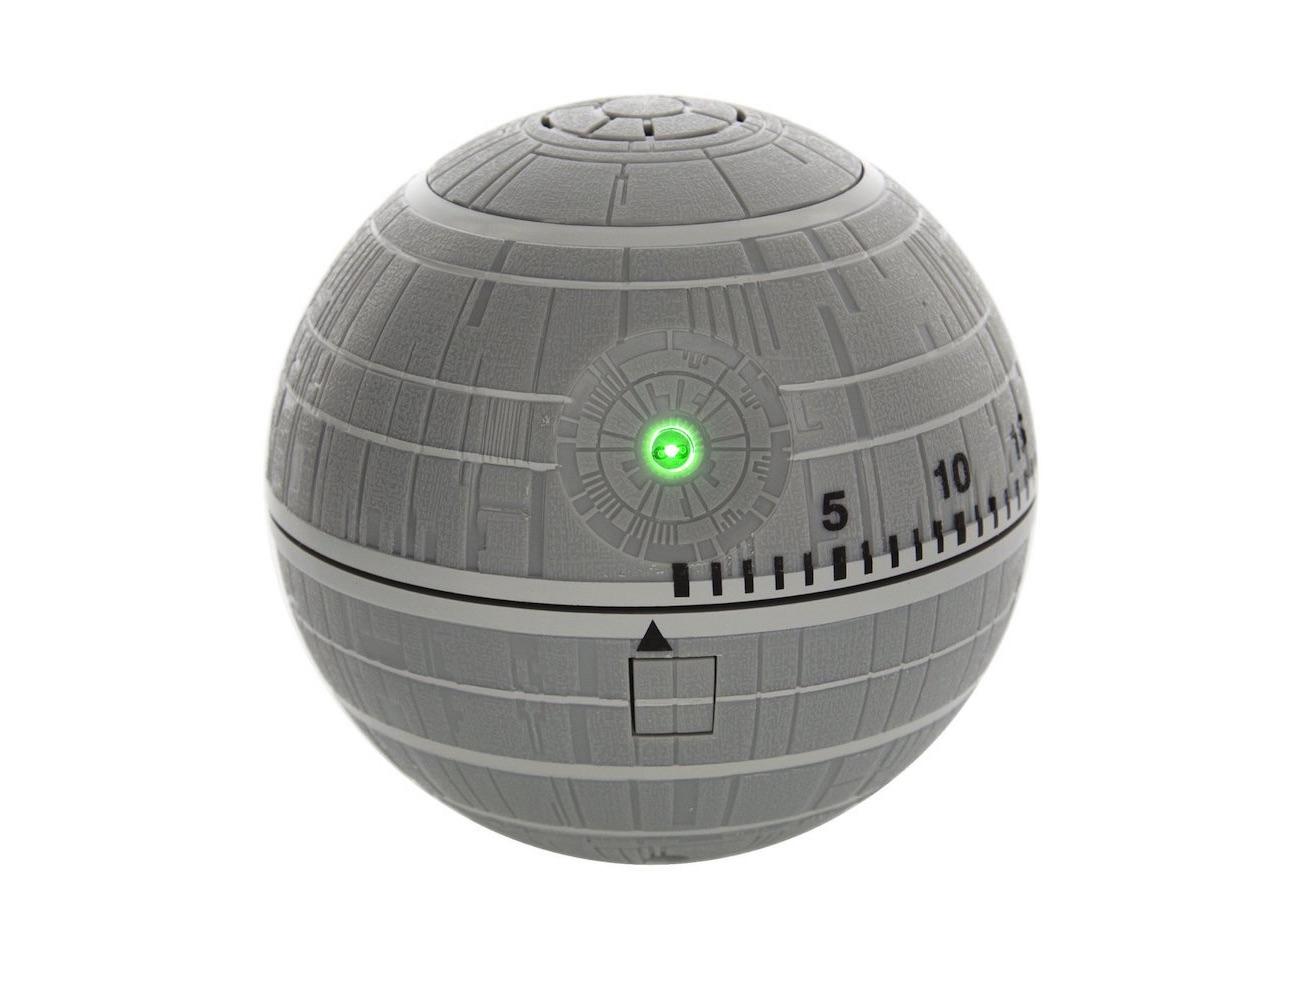 Star Wars Death Star Kitchen Timer with Sounds